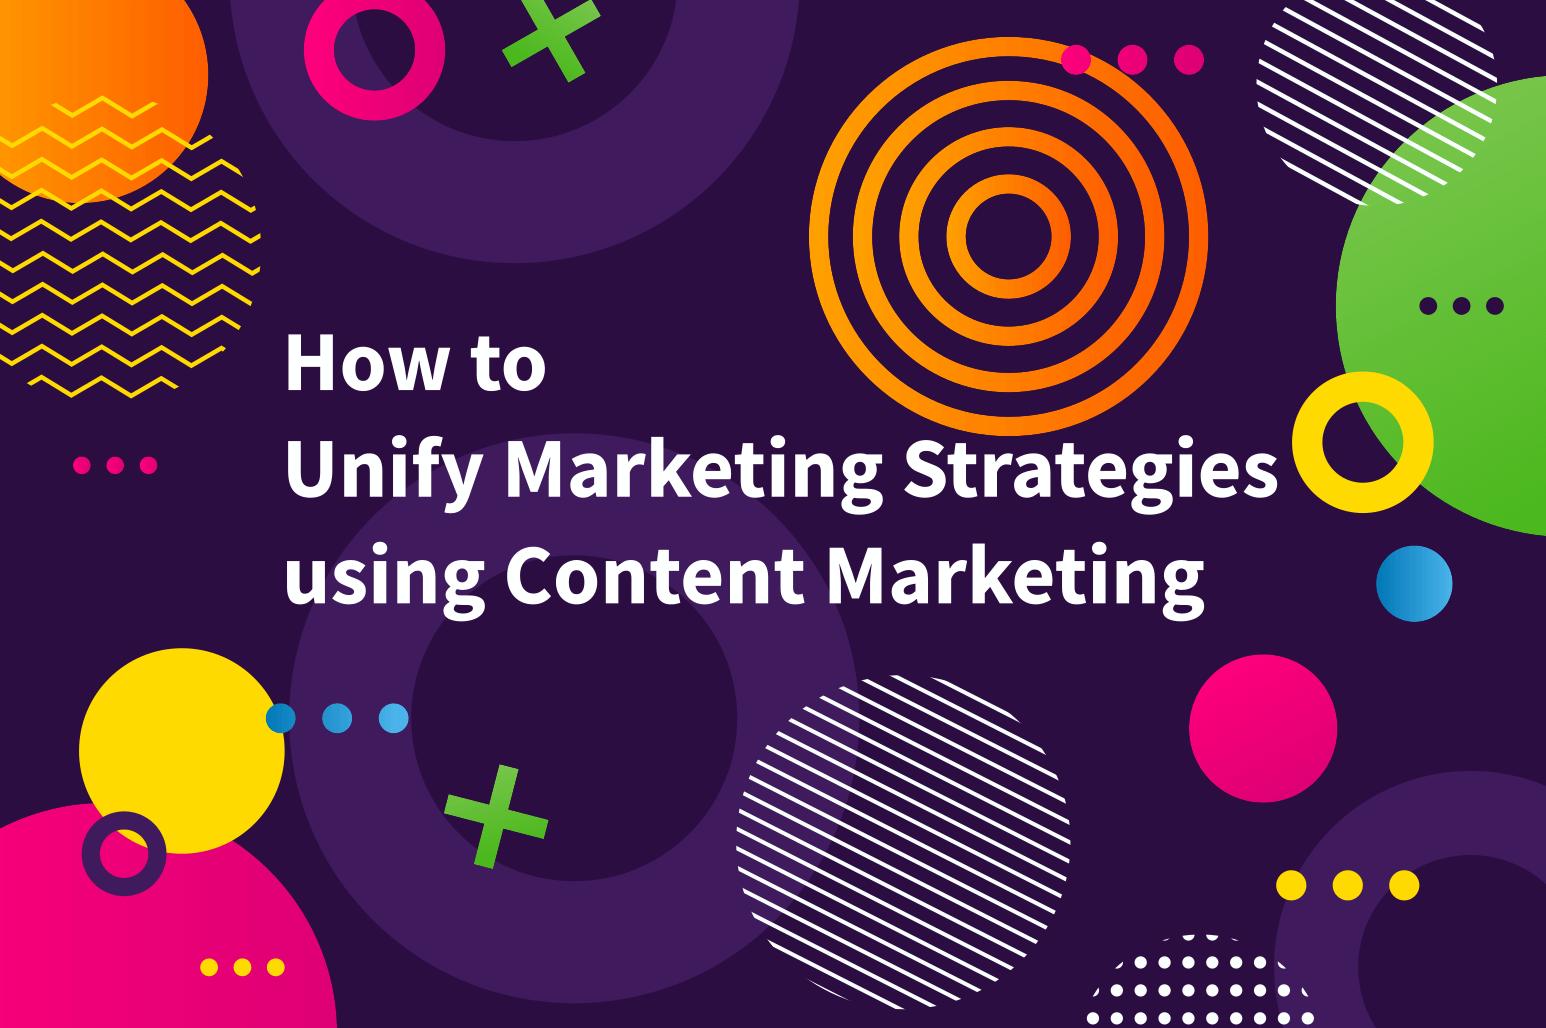 Unify marketing strategies using content marketing